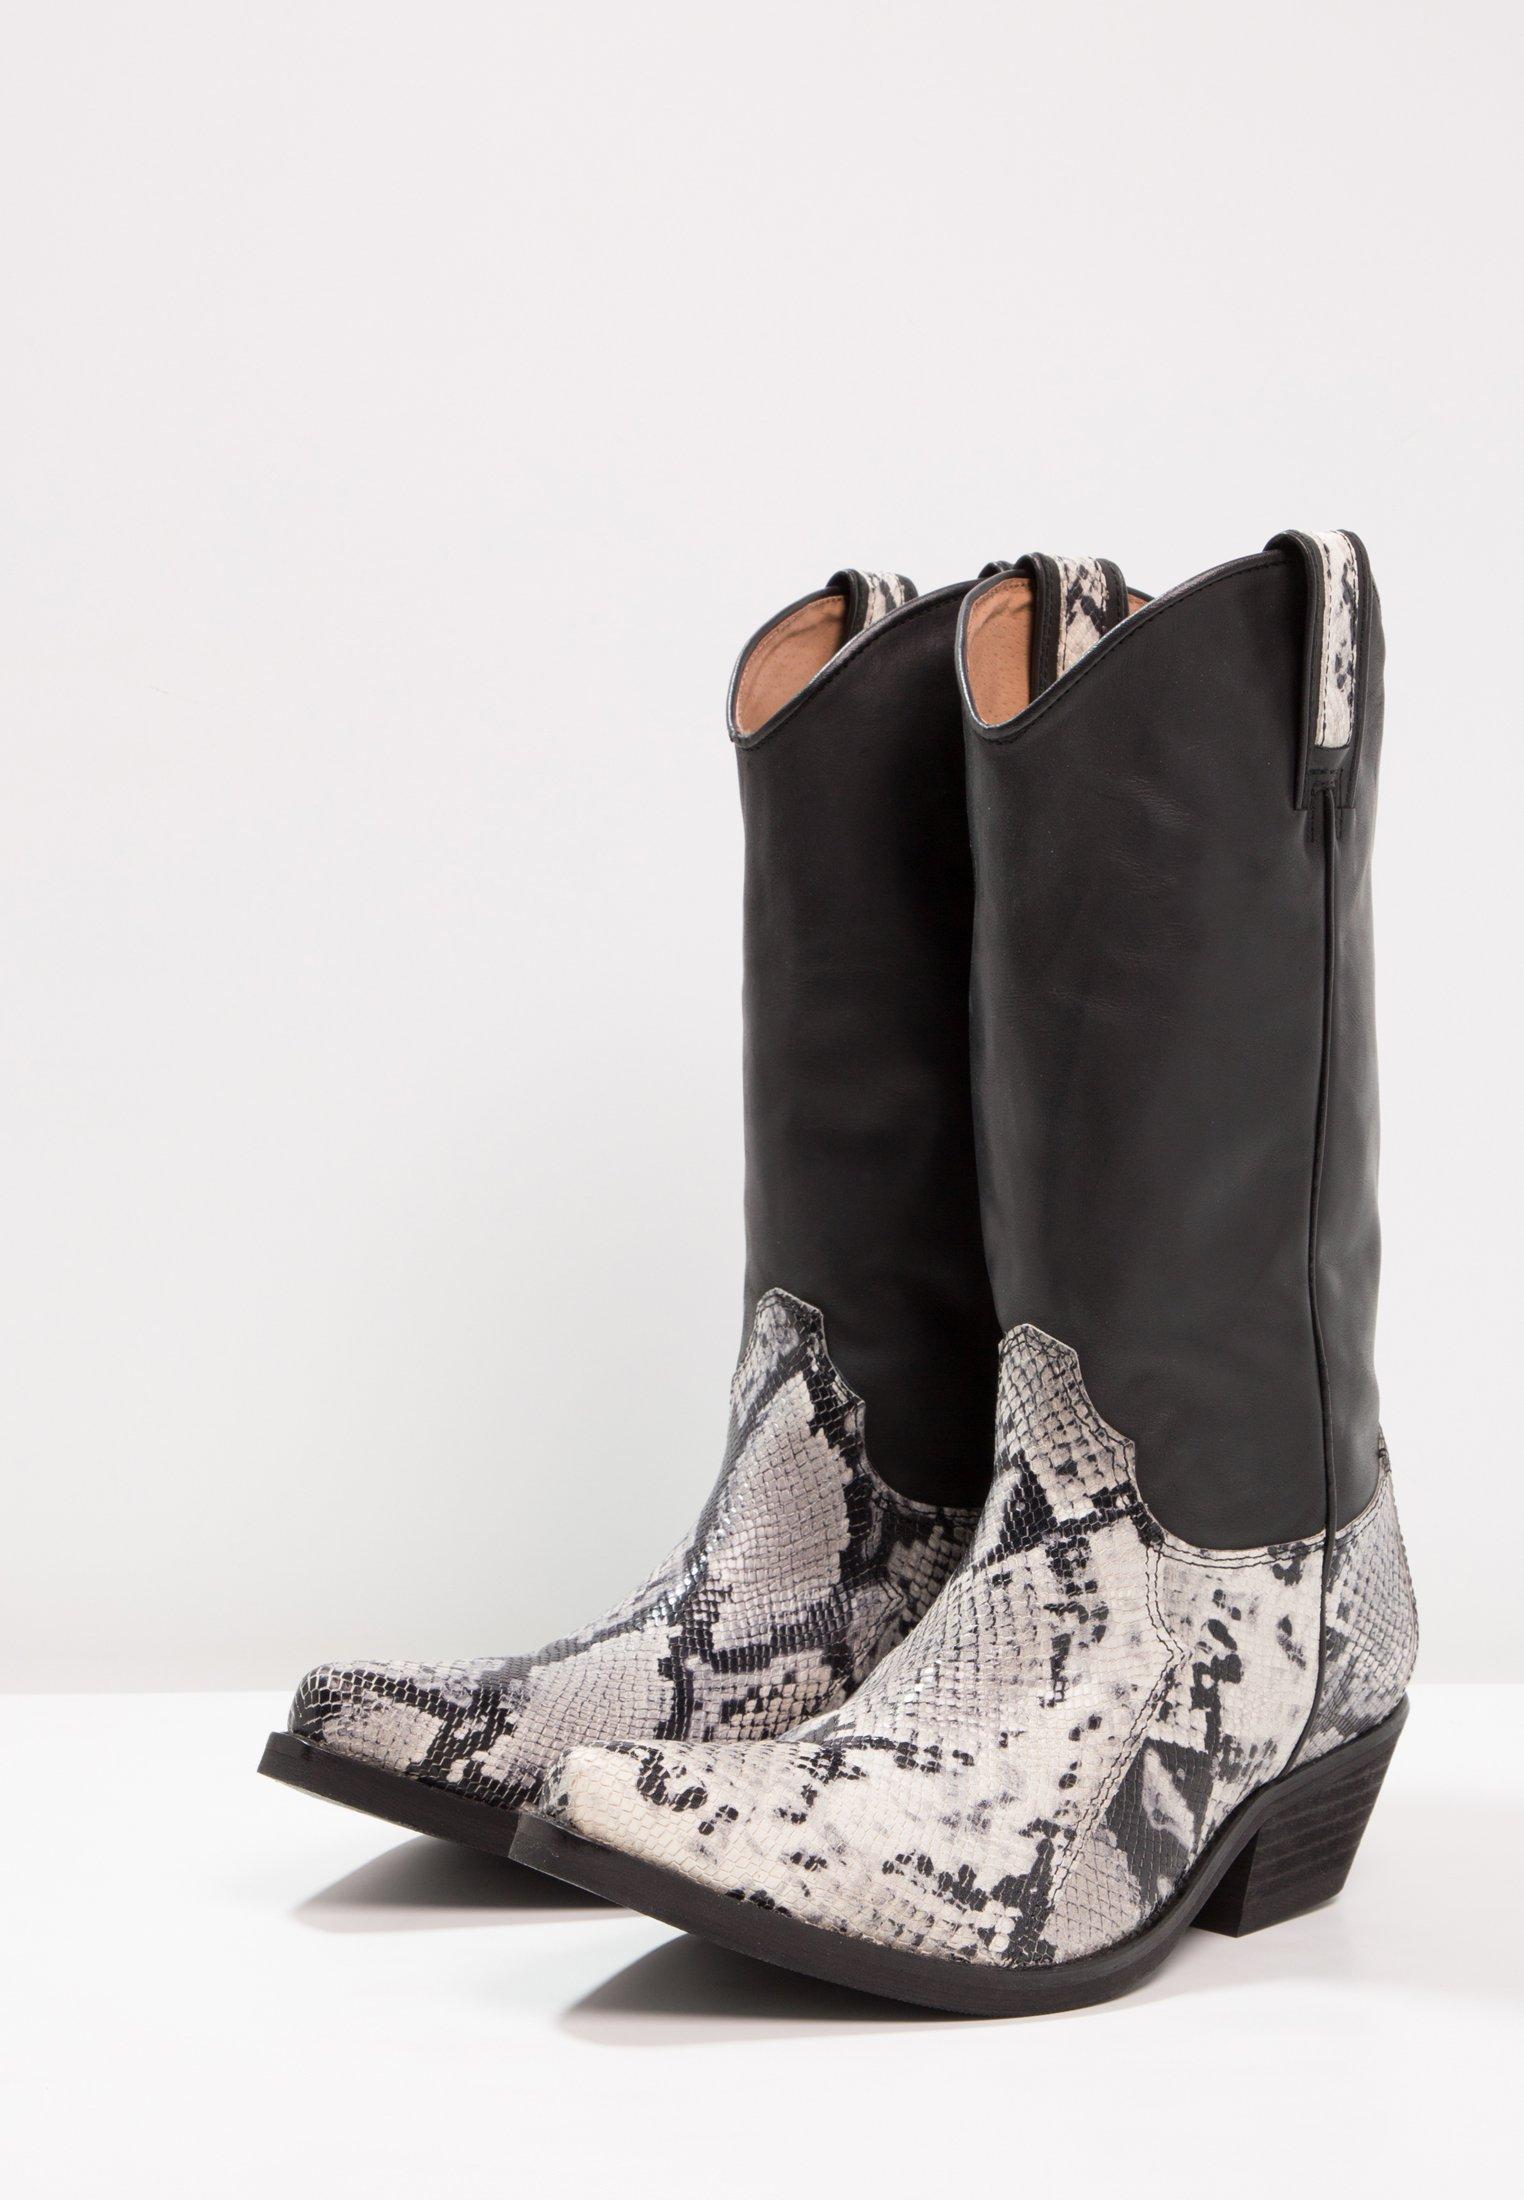 Nuovi stili Scarpe da uomo Kentucky's Western Stivali texani / biker tahore arce